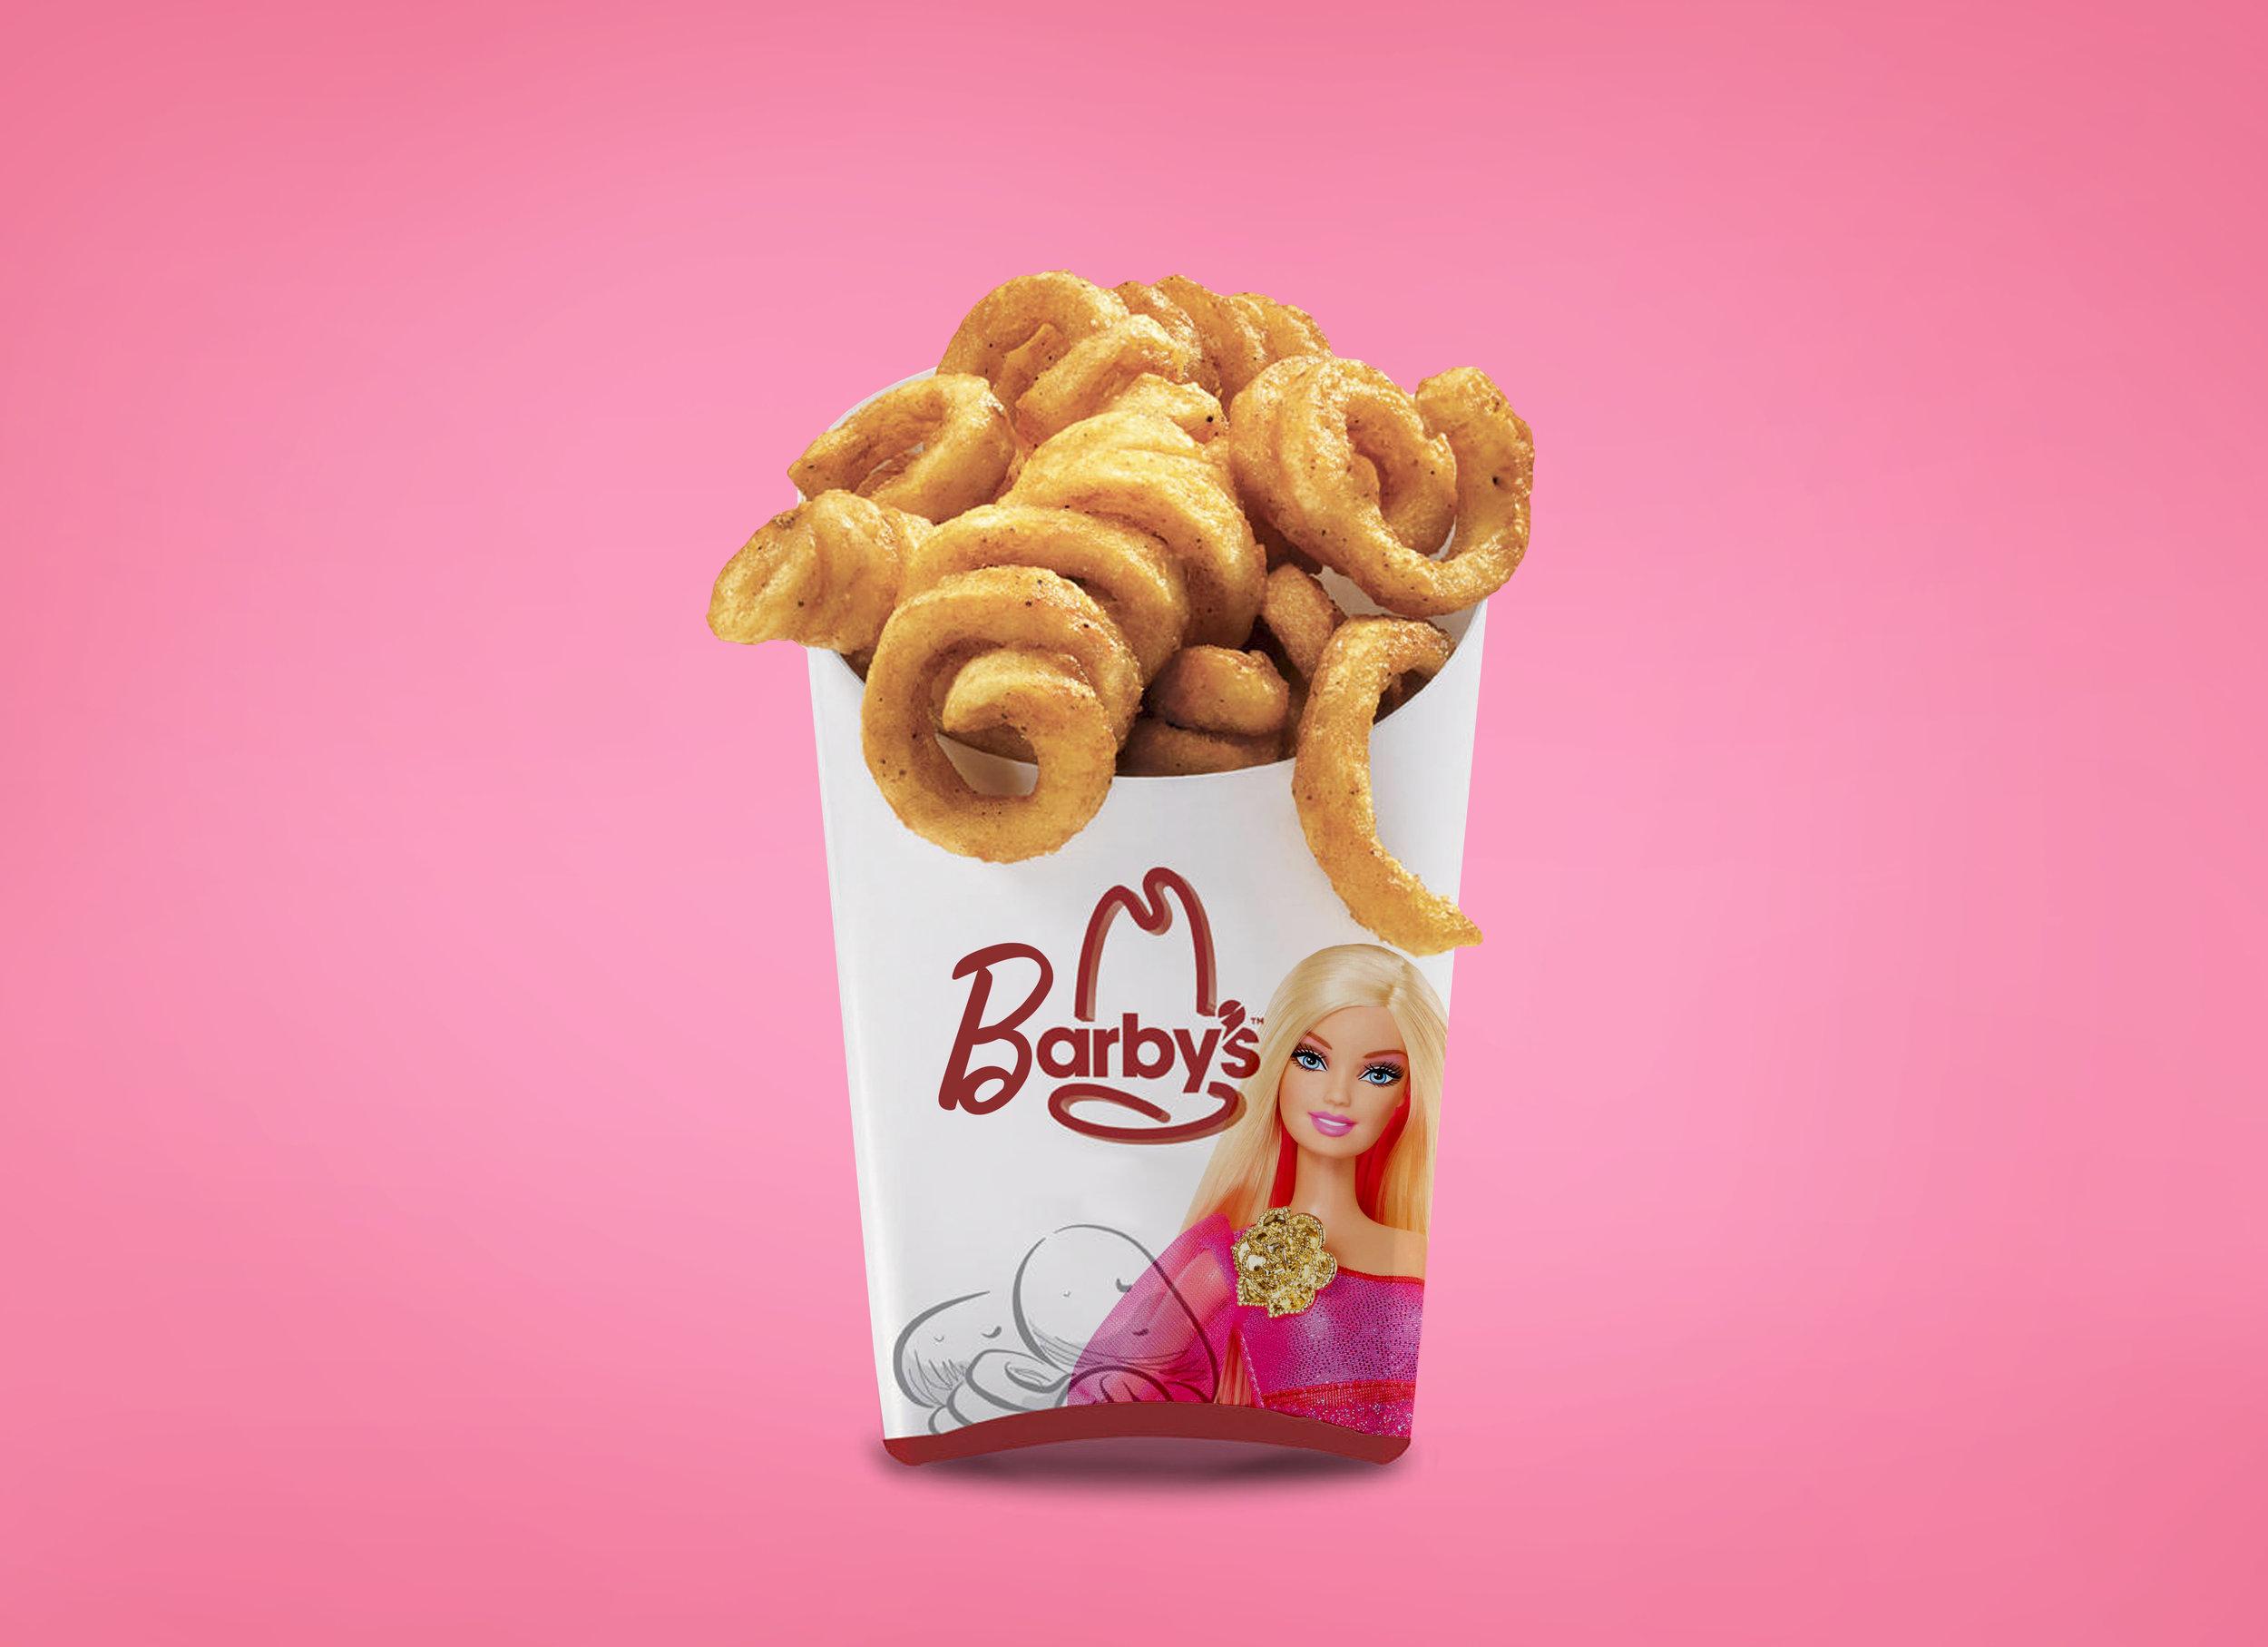 barbie's.jpg